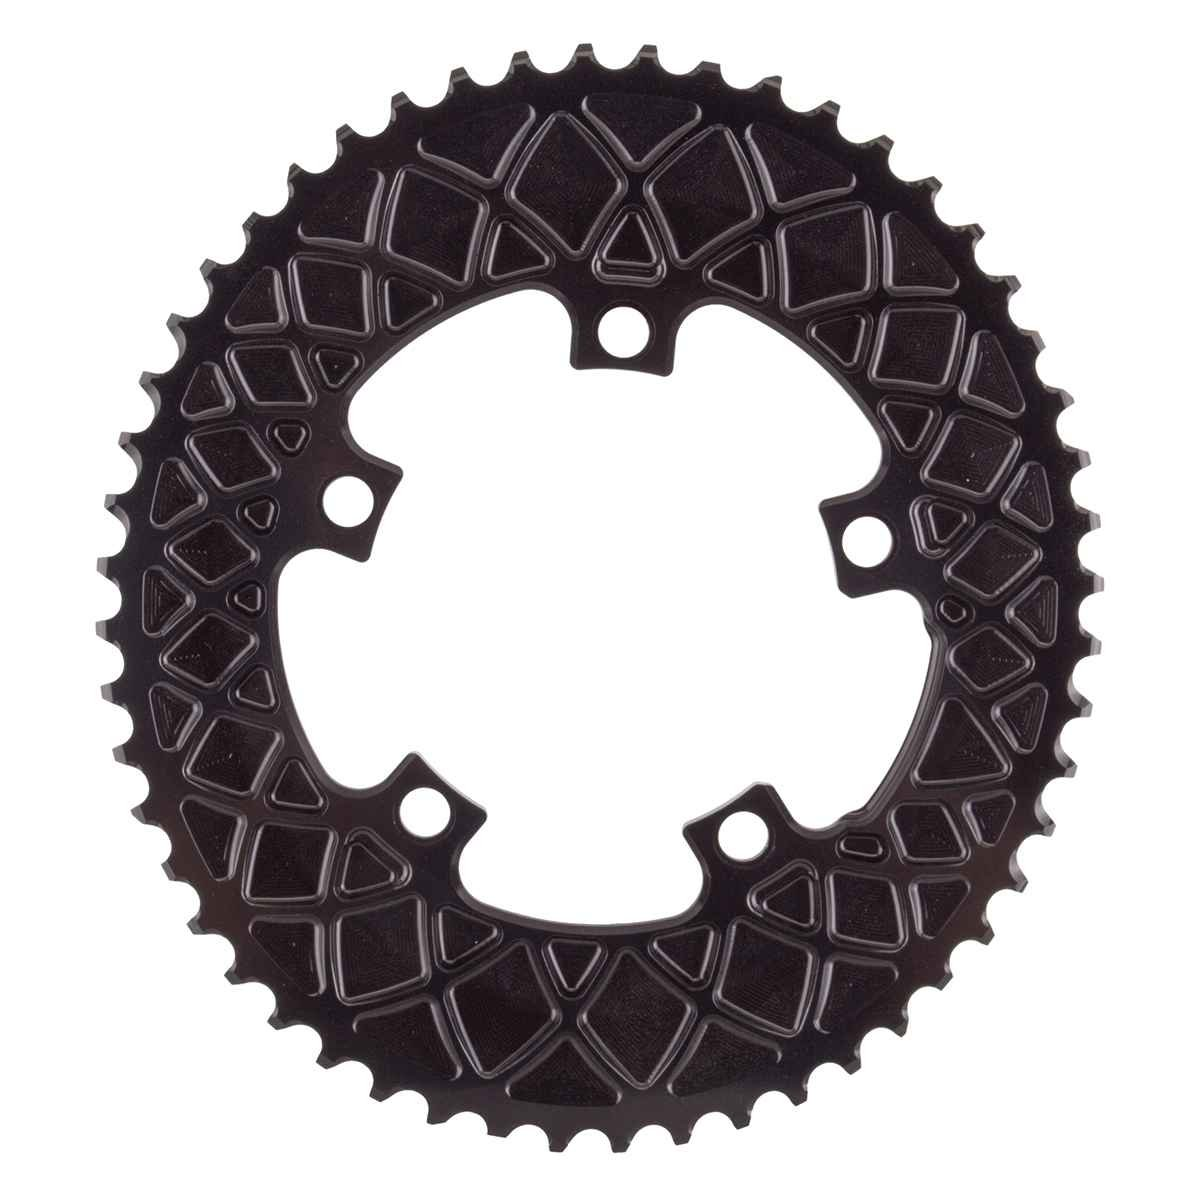 Absolute Black(アブソリュートブラック)ROV52/5BK Ovalチェーンリング ROAD 52T 110PCD 5アーム用 ブラック B01GQWH8IW